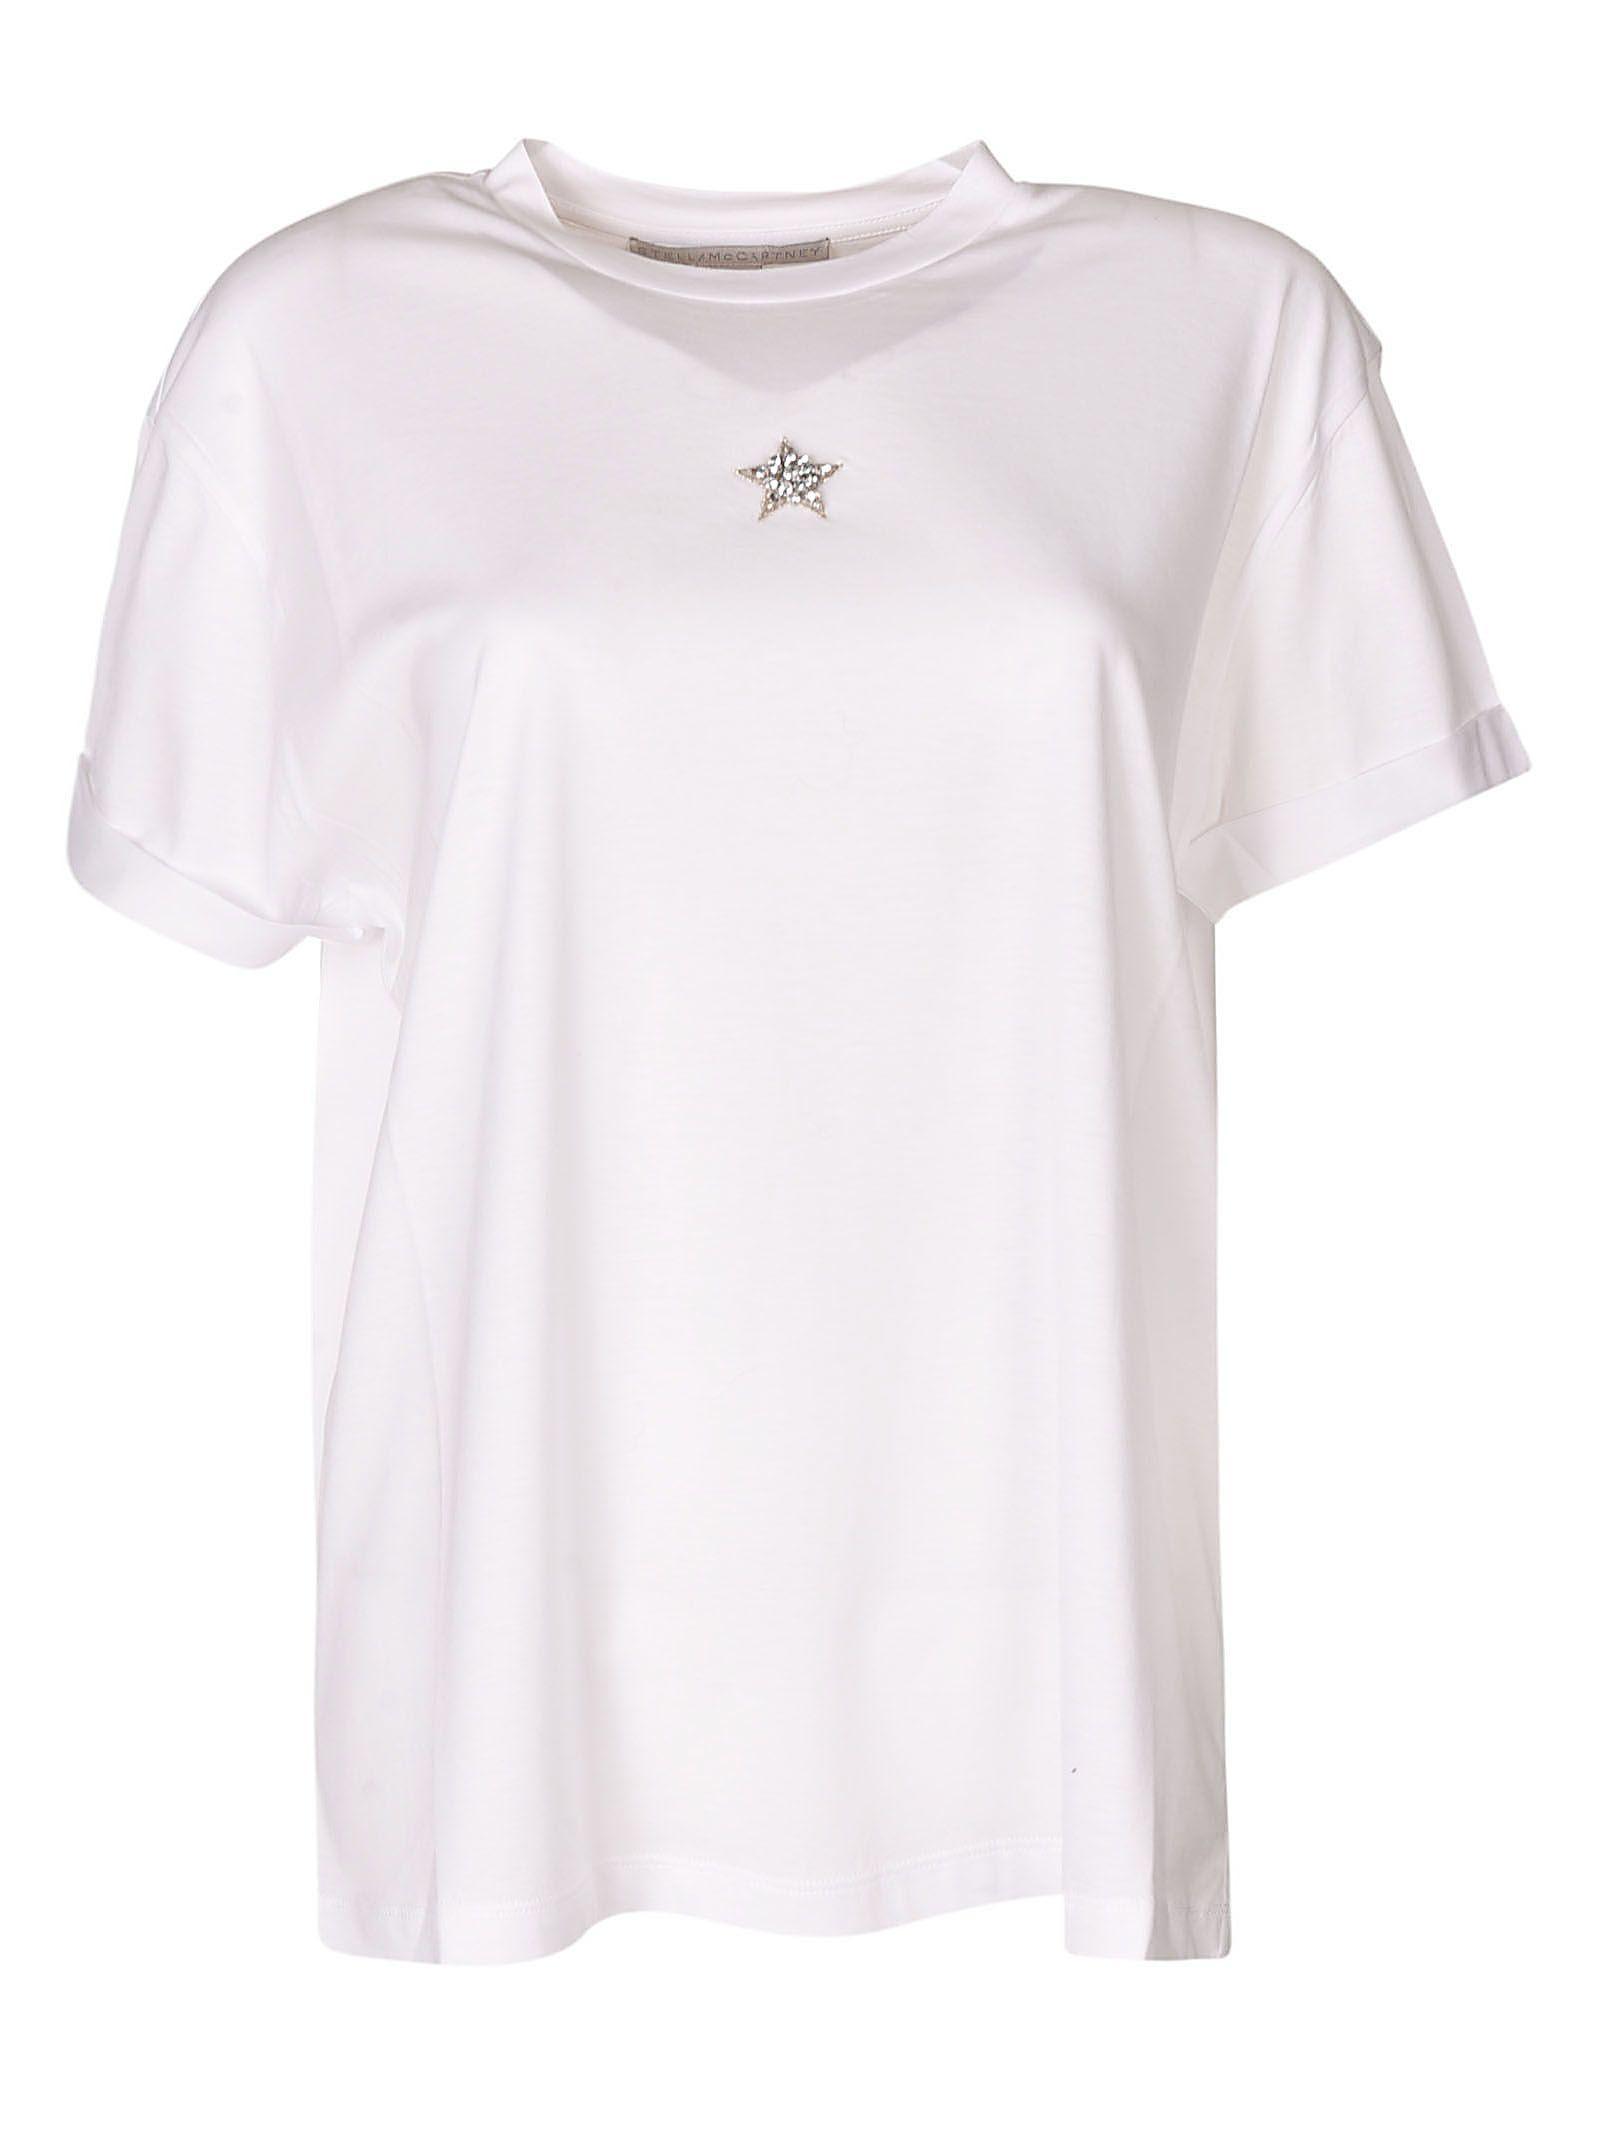 2606f4f2b45ee Stella Mccartney Embellished Star T-Shirt In 9000 Pure W